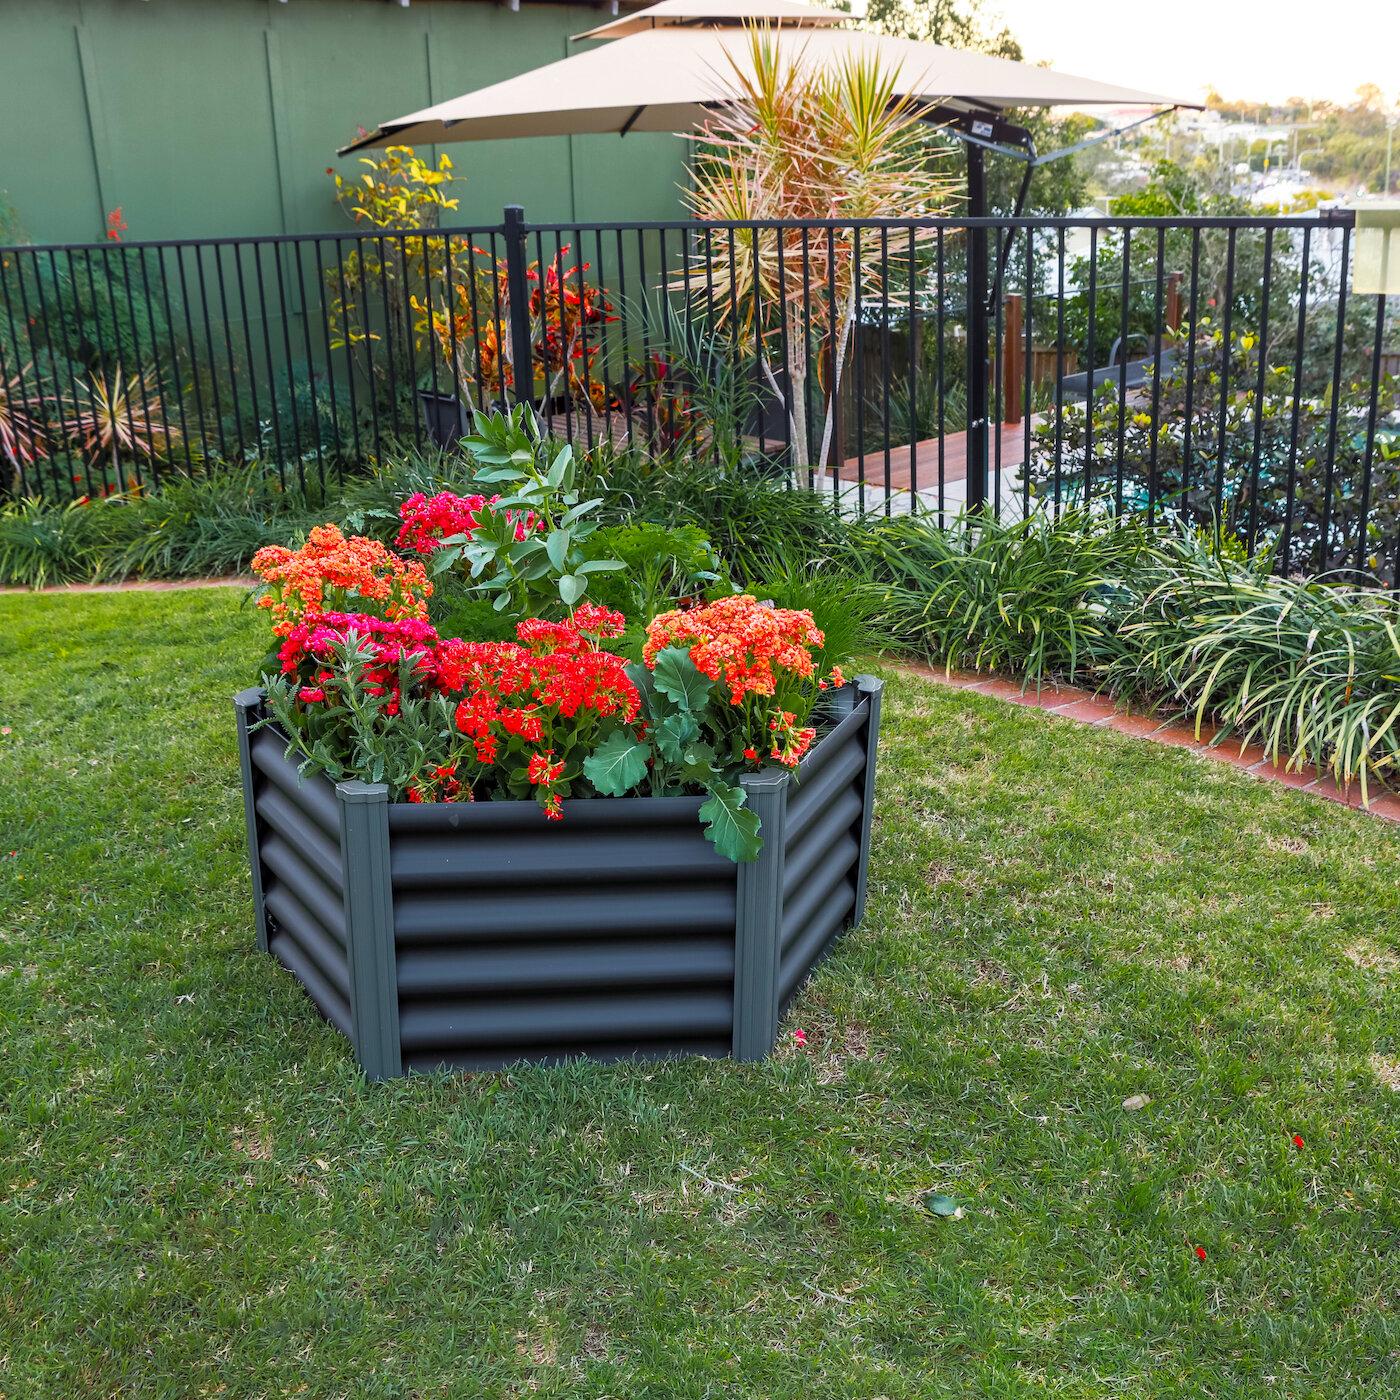 The Organic Garden Co Hexagonal 1 5 Ft X 3 Ft Galvanized Steel Raised Garden Wayfair